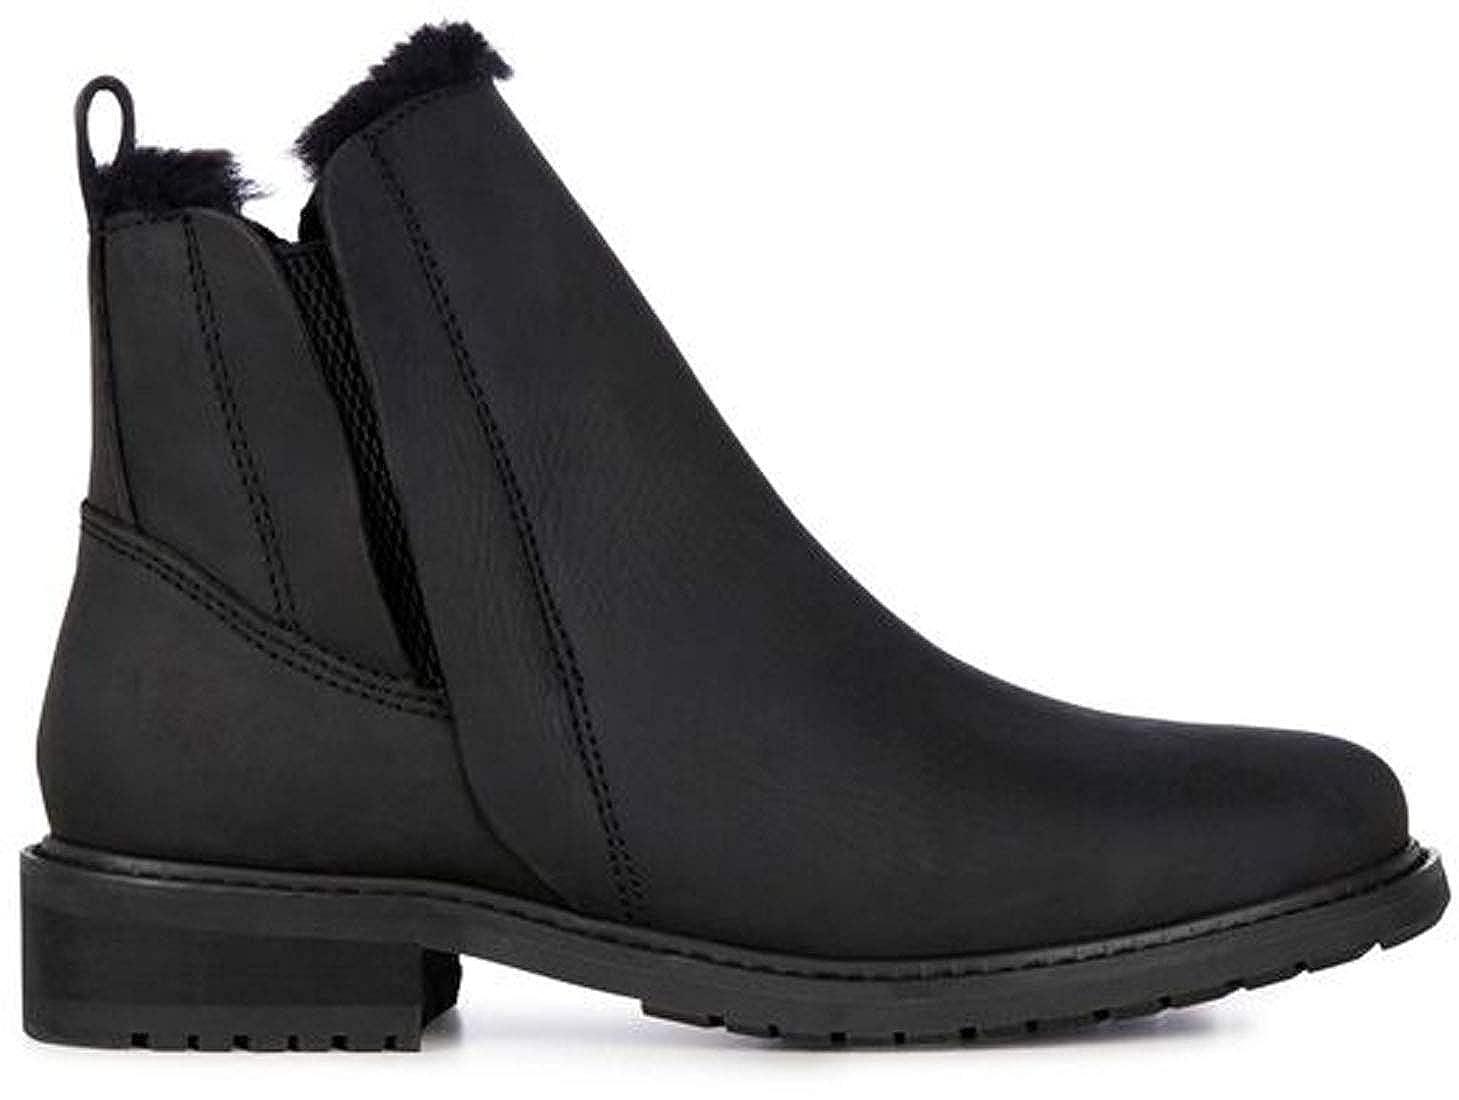 za kilka dni Data wydania kup popularne EMU Australia Pioneer Leather Womens Deluxe Wool Waterproof Boots